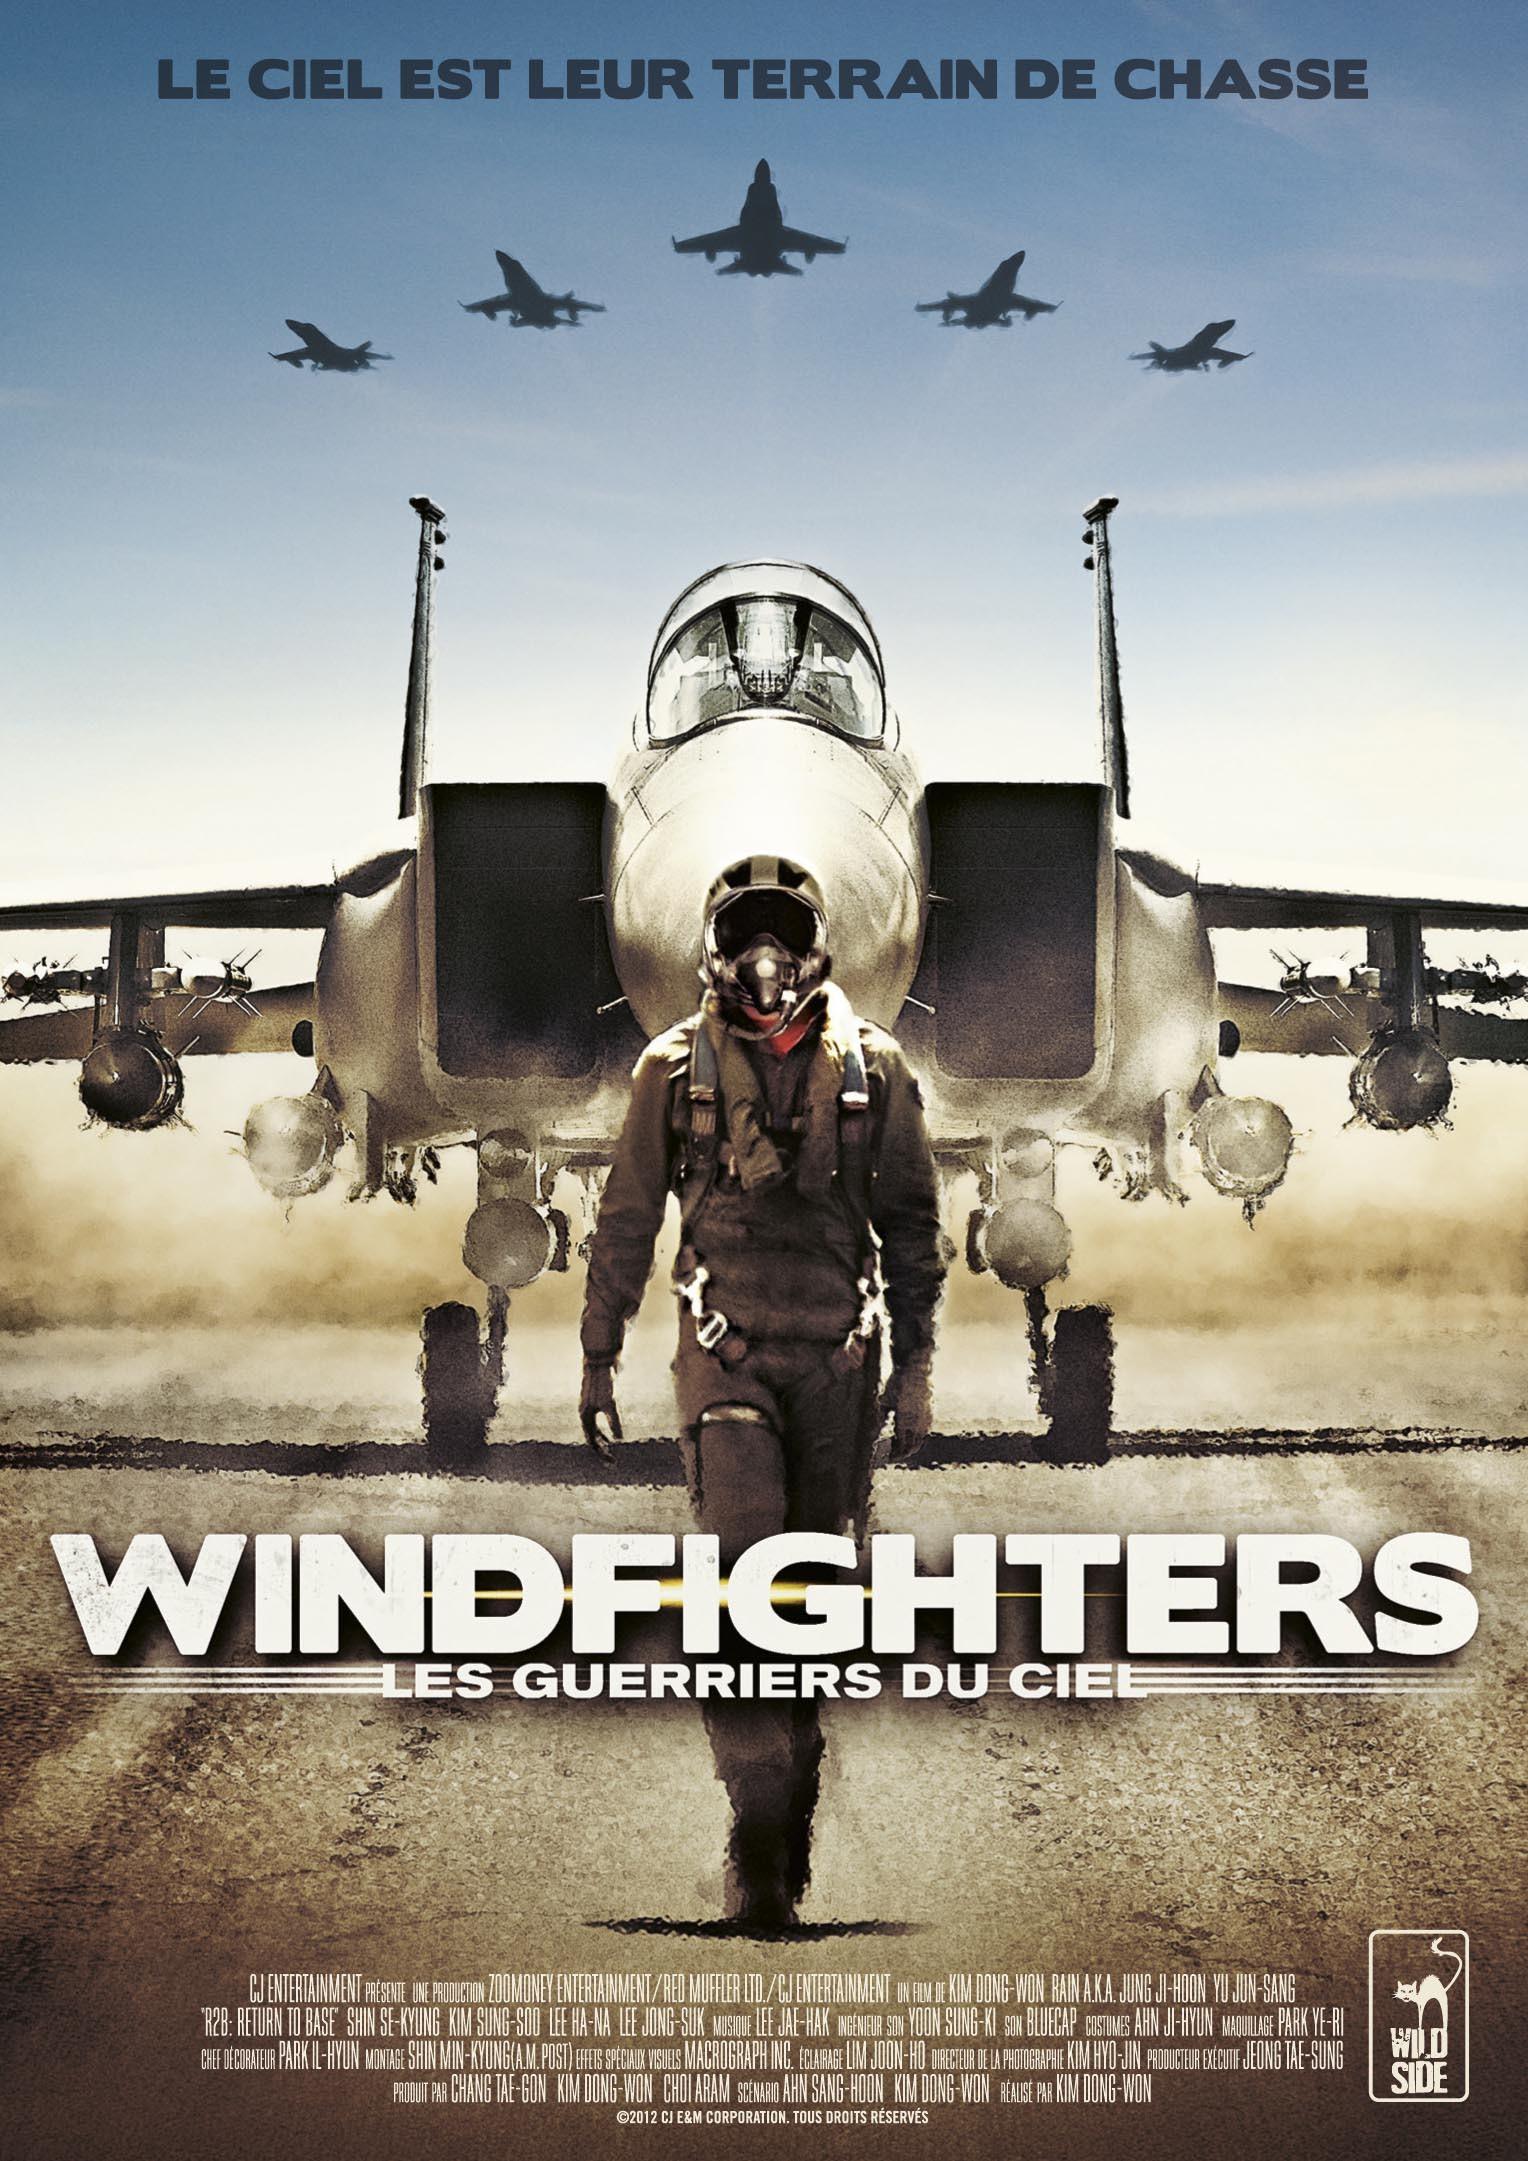 Films nationaux et internationaux - Page 28 Windfighters-affiche-51a7882100cc5